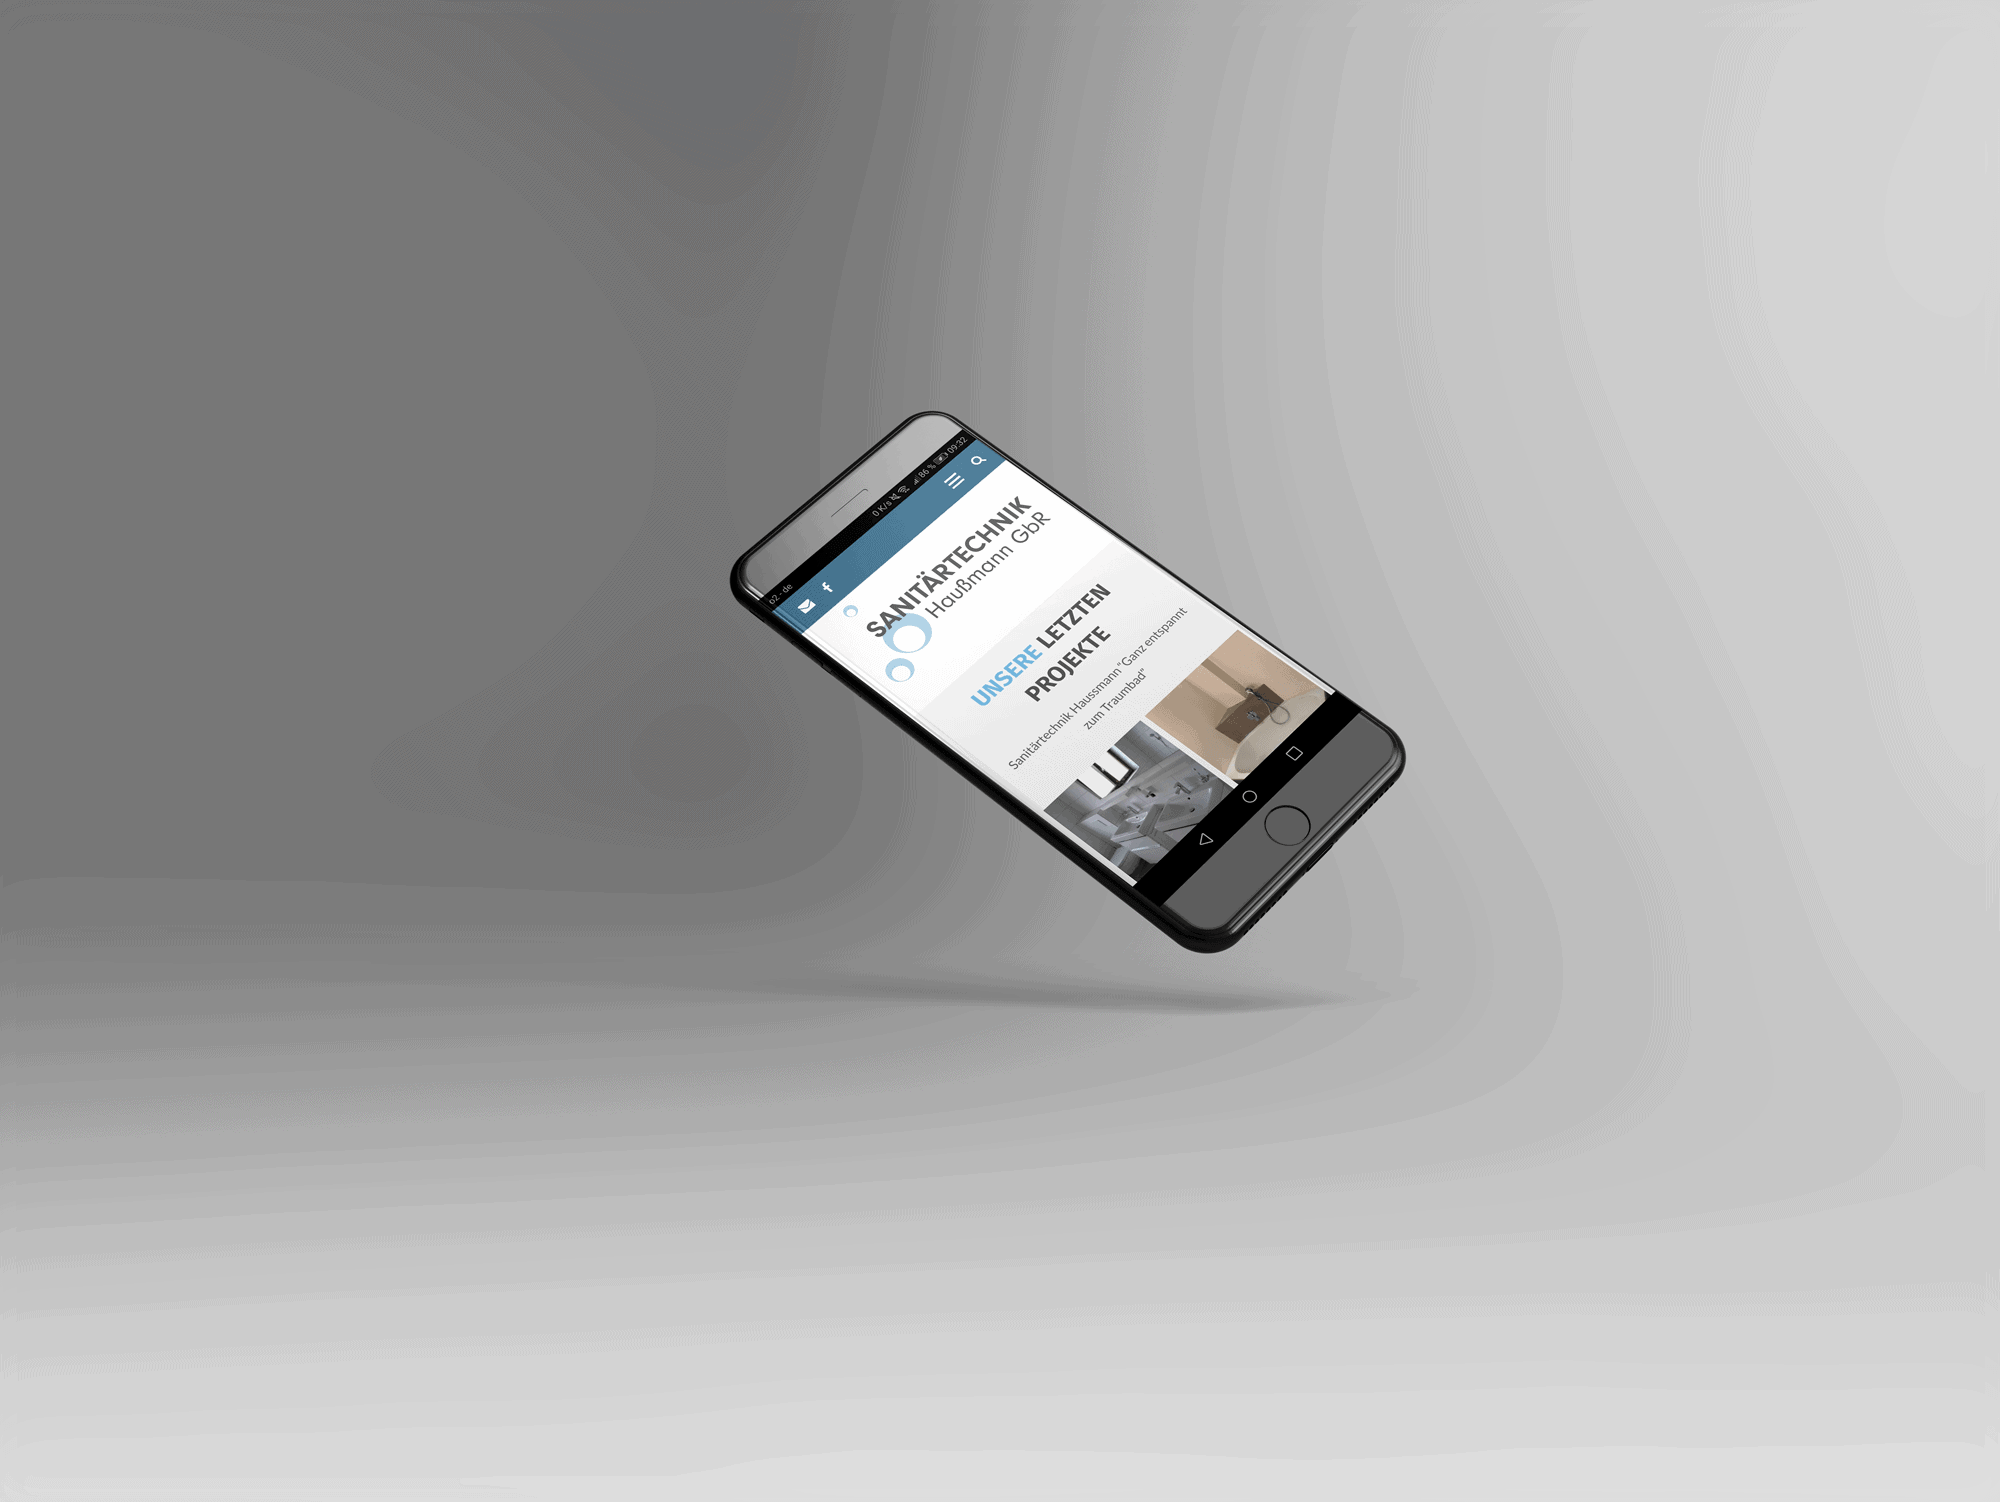 sanitaertechnik-haussmann-kirchheim-liebespixel-webdesign-seo-analytics-responsive-handy